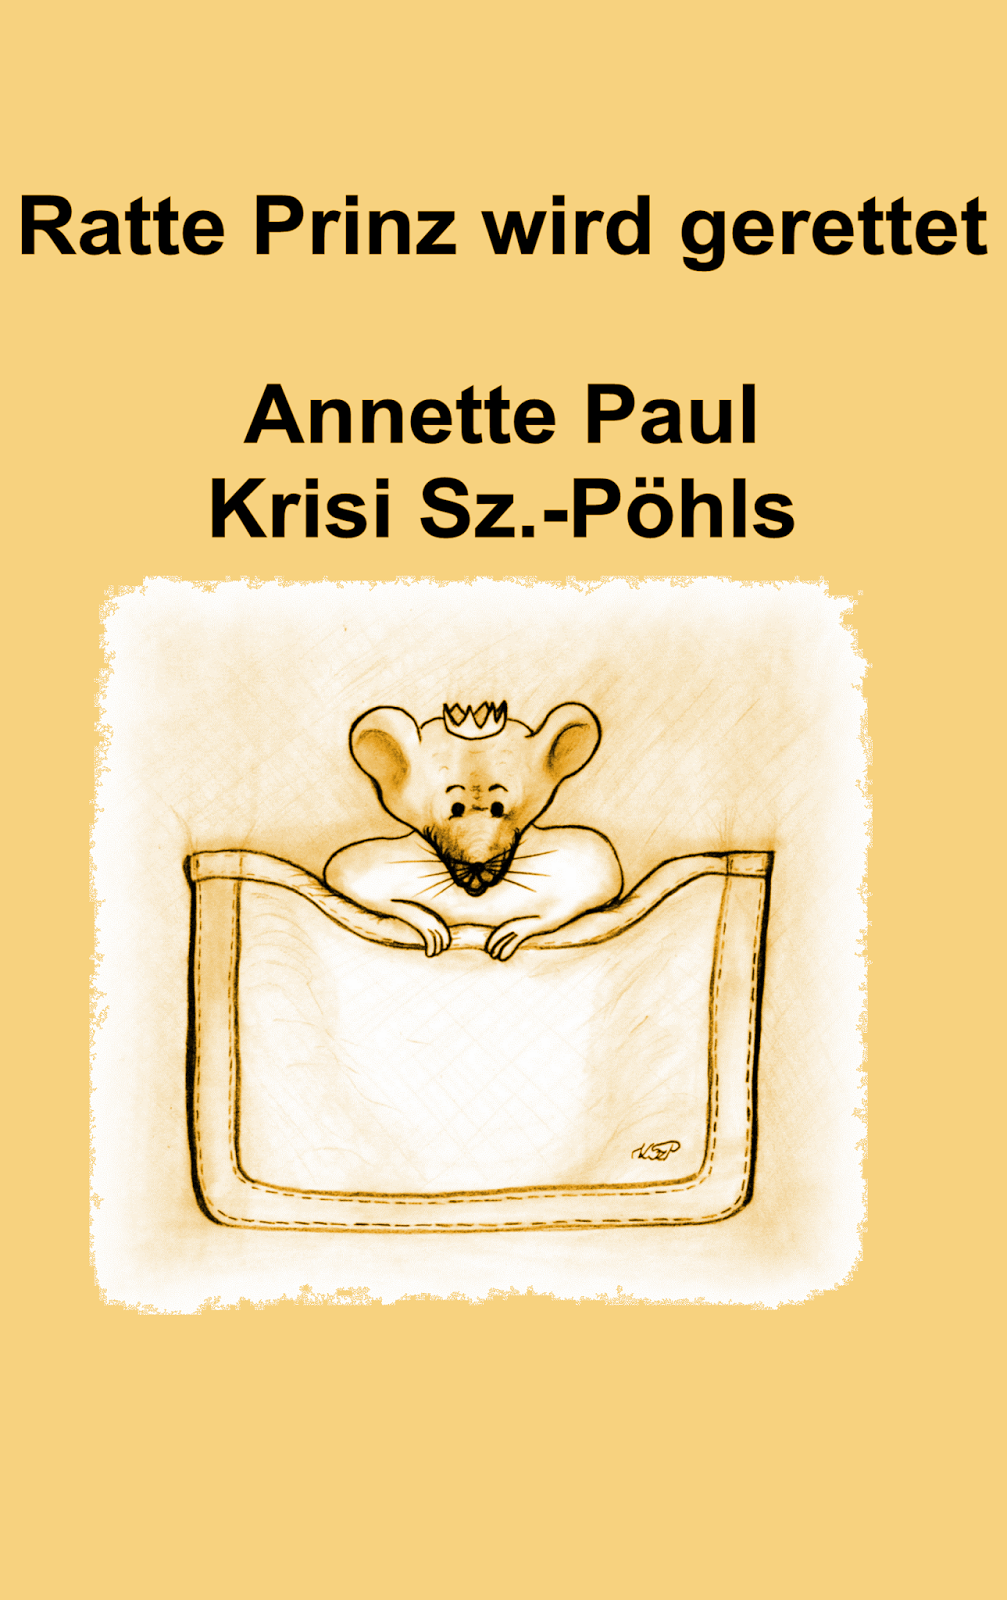 http://www.bookrix.de/_ebook-annette-paul-ratte-prinz-wird-gerettet/